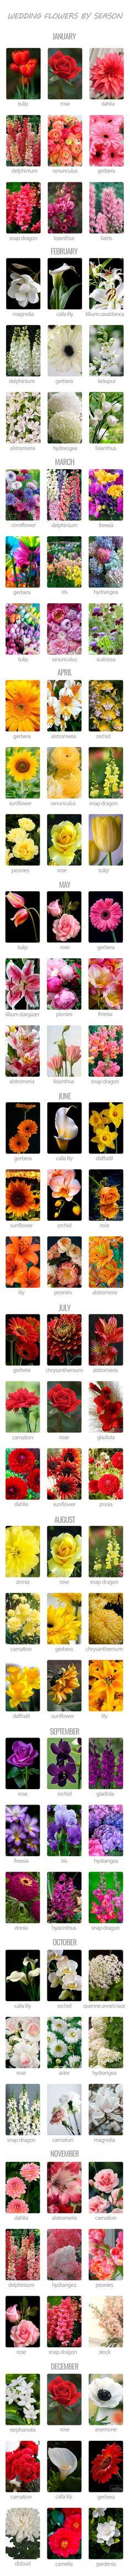 Choosing Wedding Flowers By Season ❤ Want to save money on your wedding? Choose in season flowers! See more: http://www.weddingforward.com/choosing-wedding-flowers-season/ #weddings #bouquets